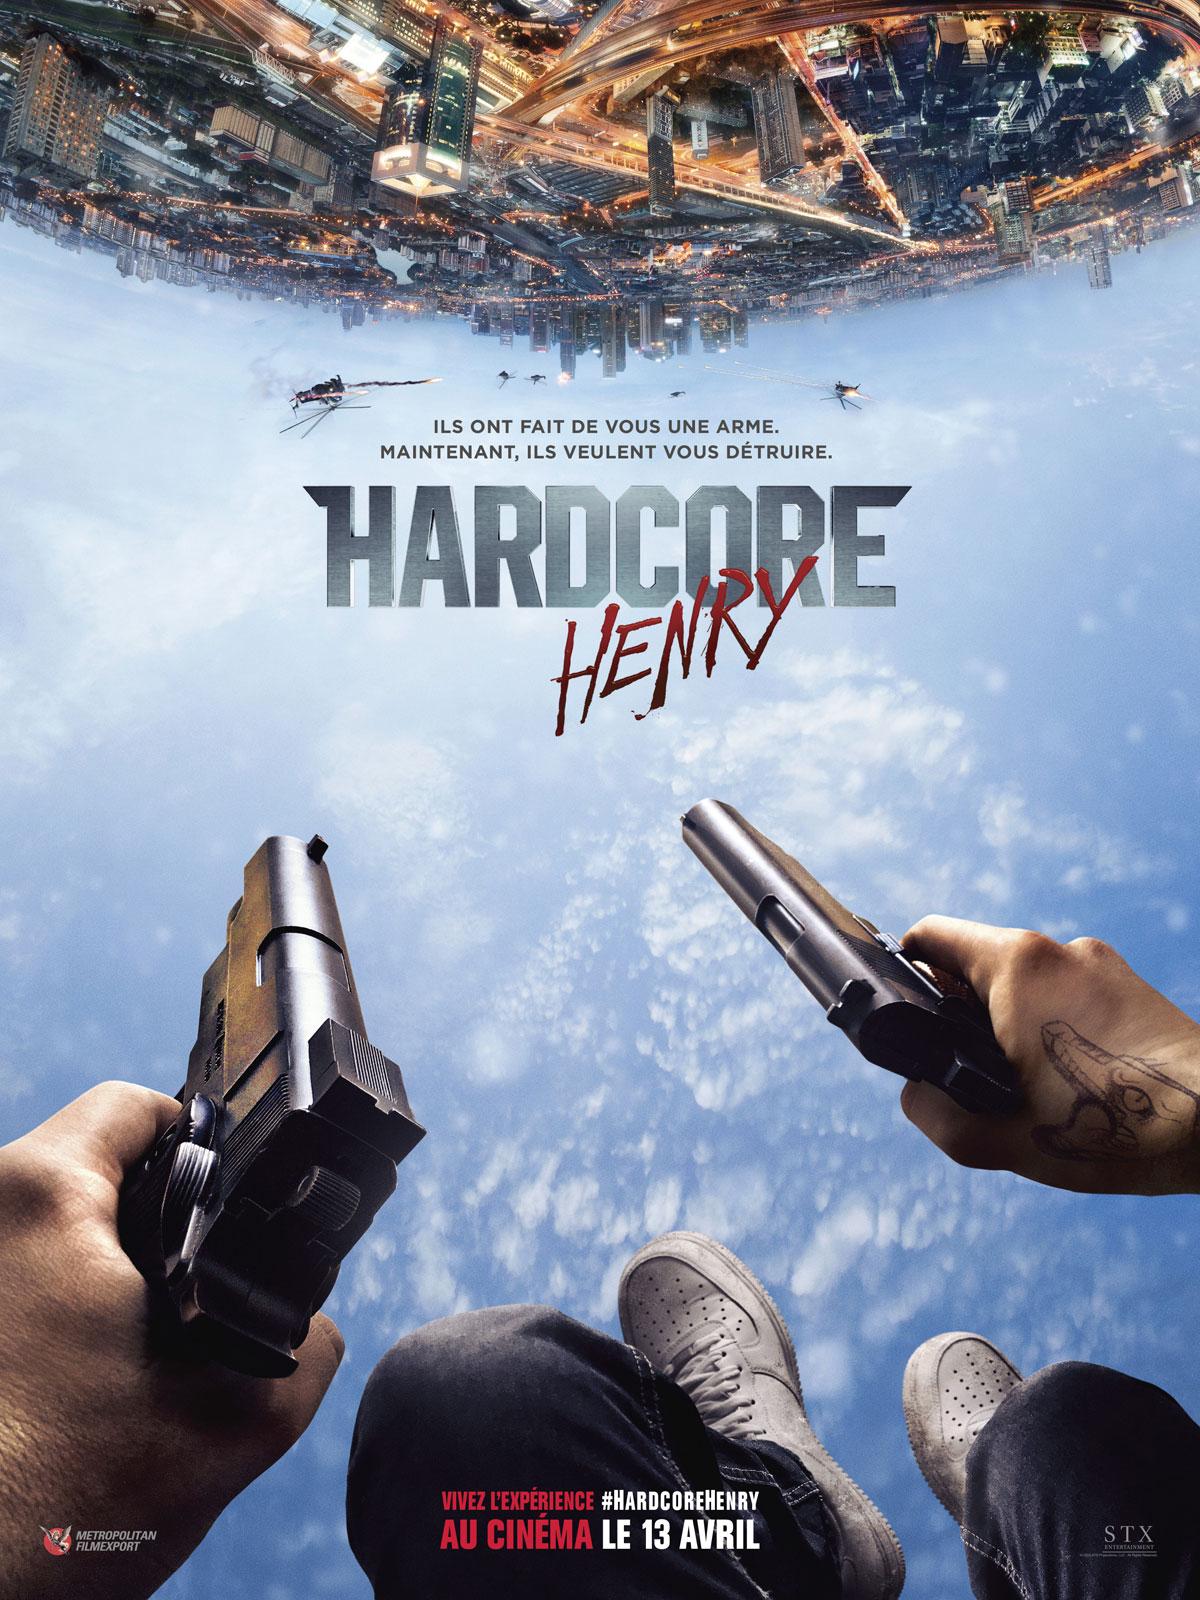 Hardcore Henry ddl